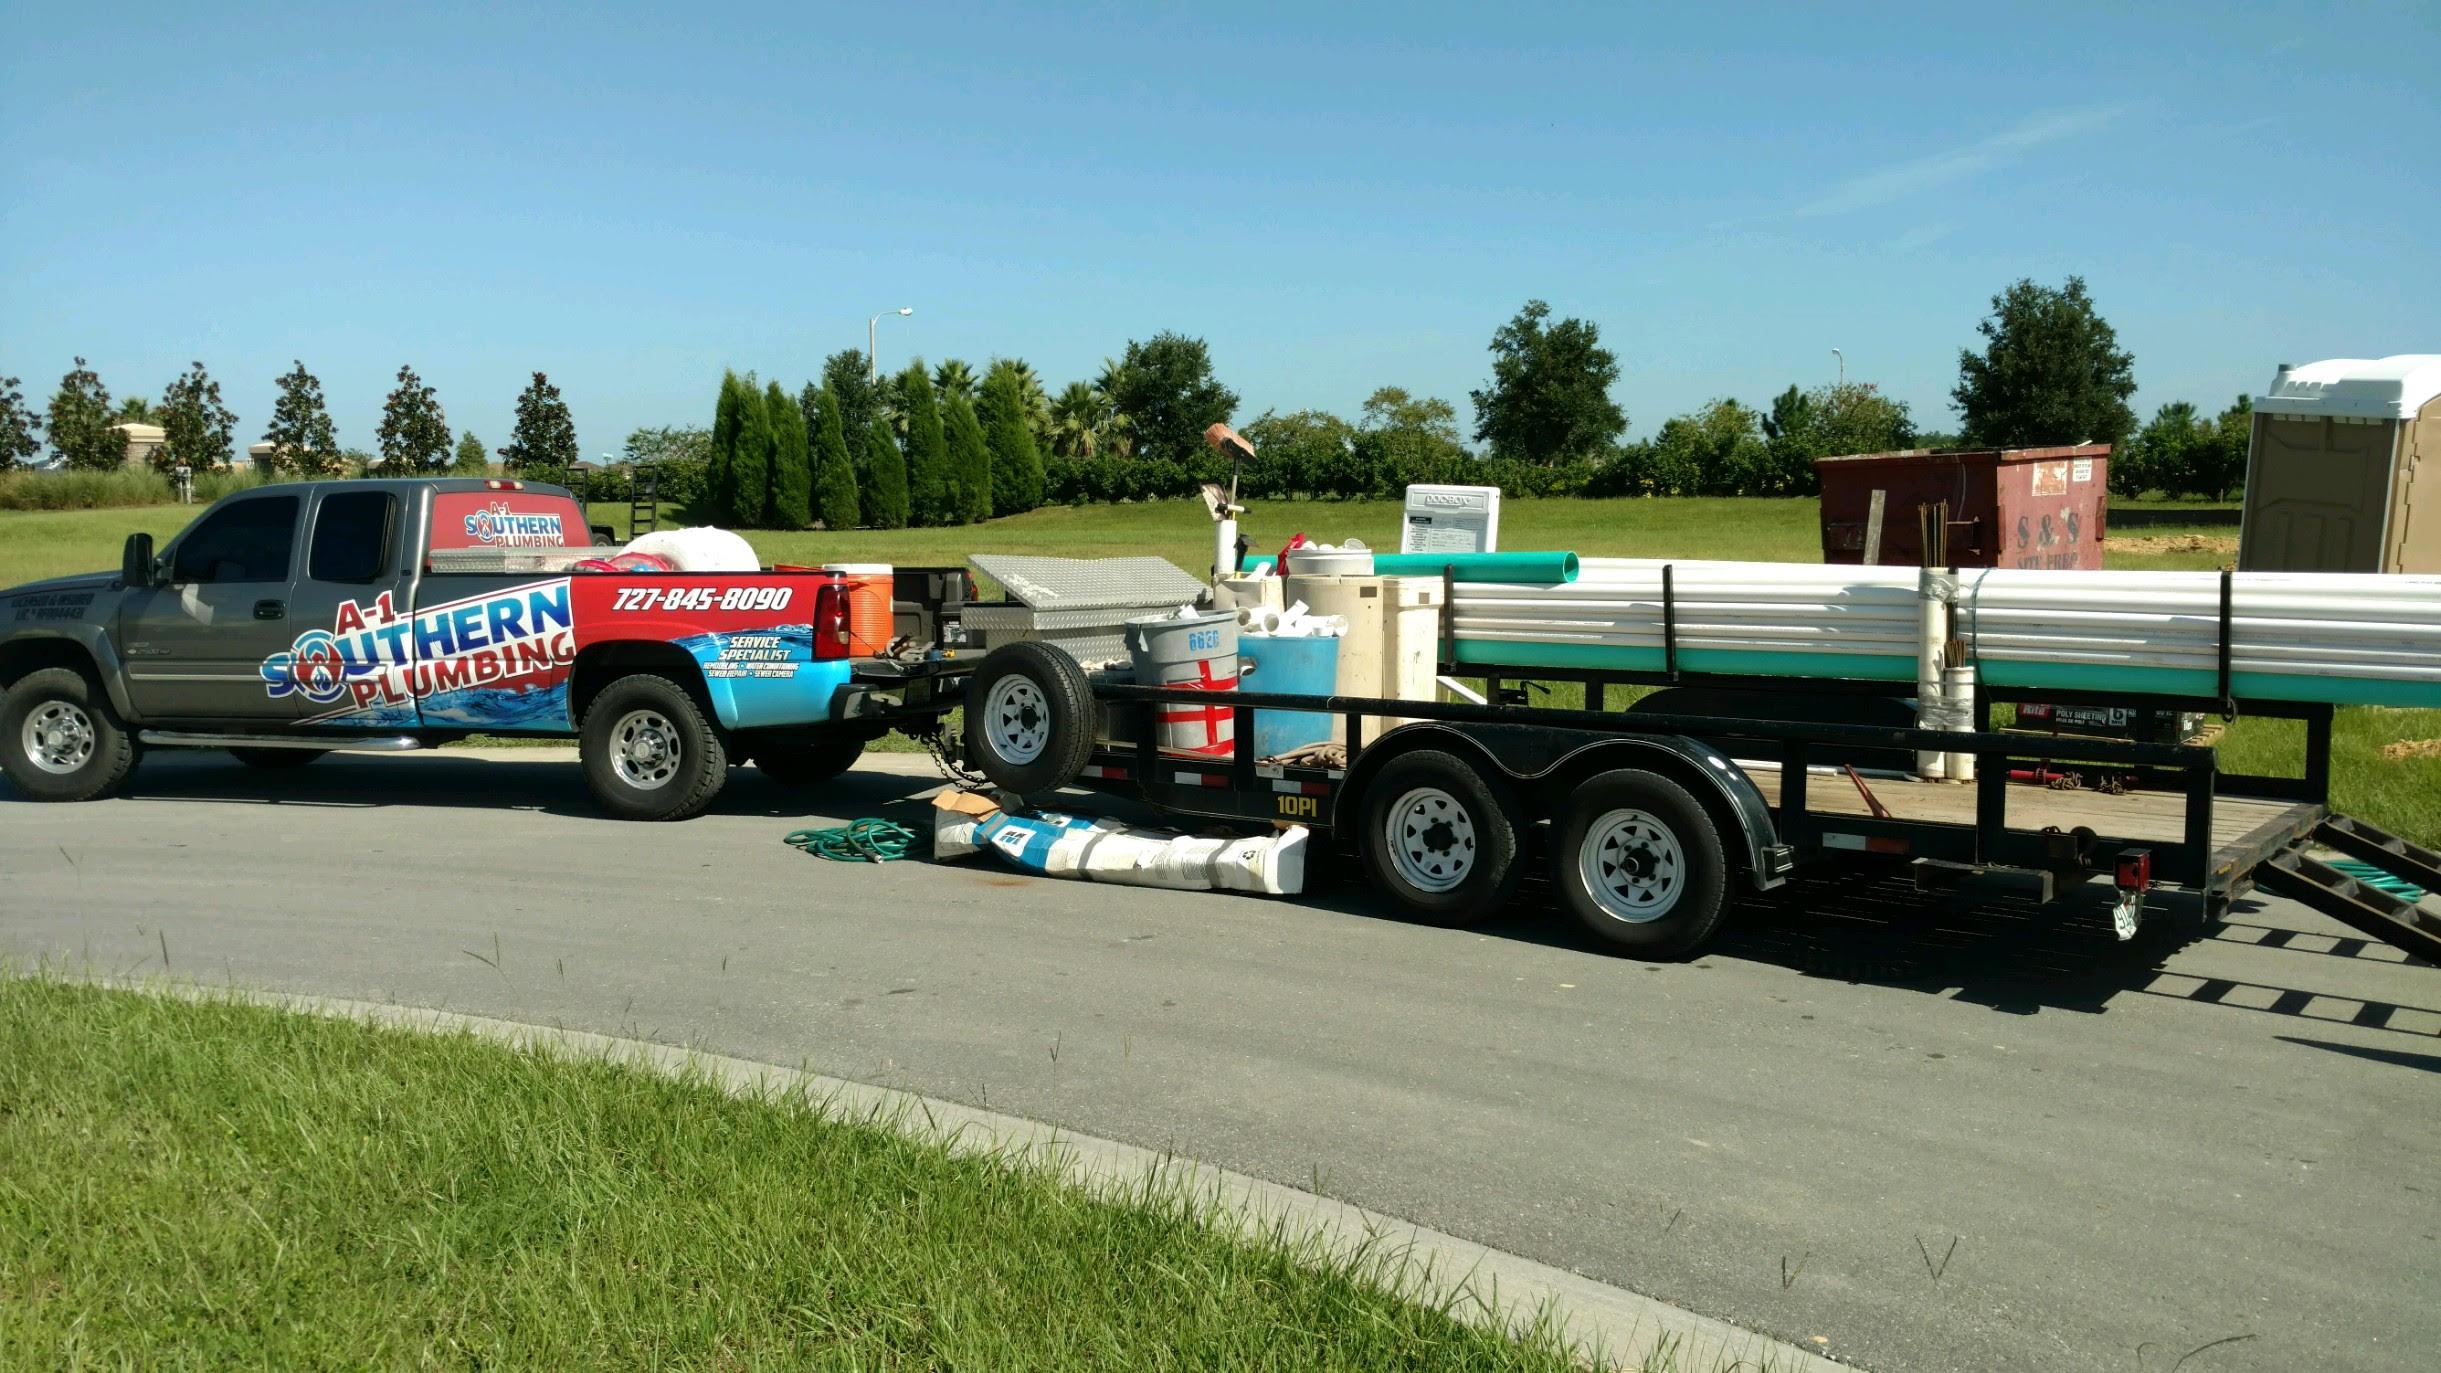 A-1 Southern Plumbing New construction Trucks